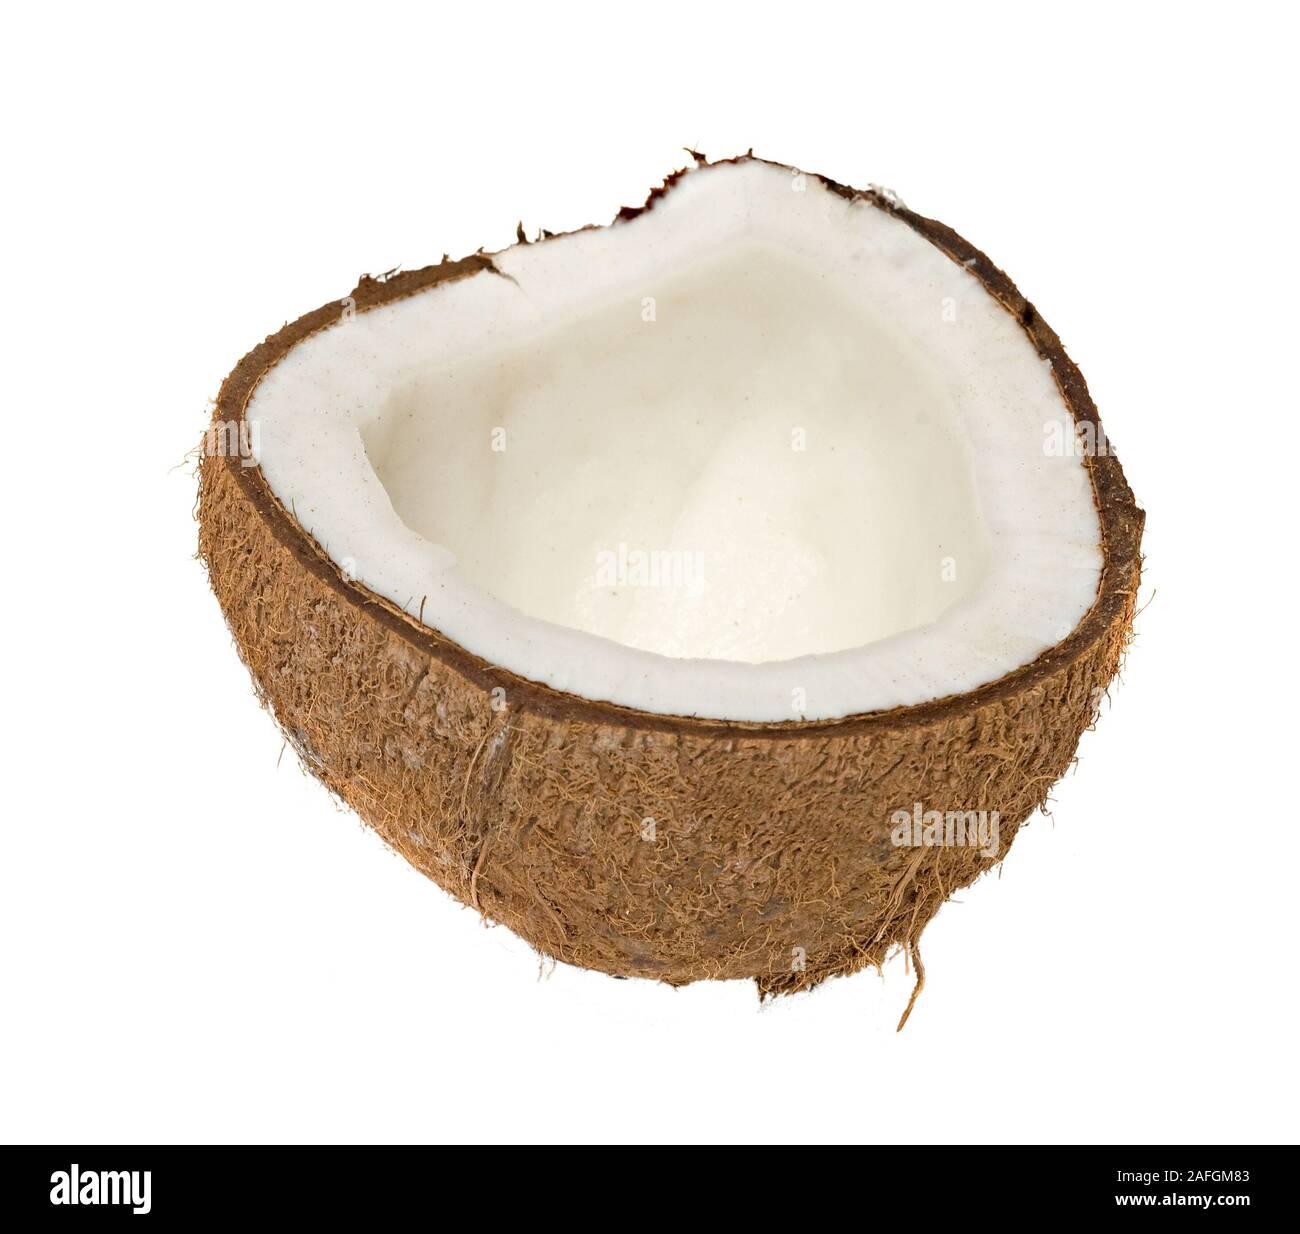 Section of cocanut isolated on white background Stock Photo